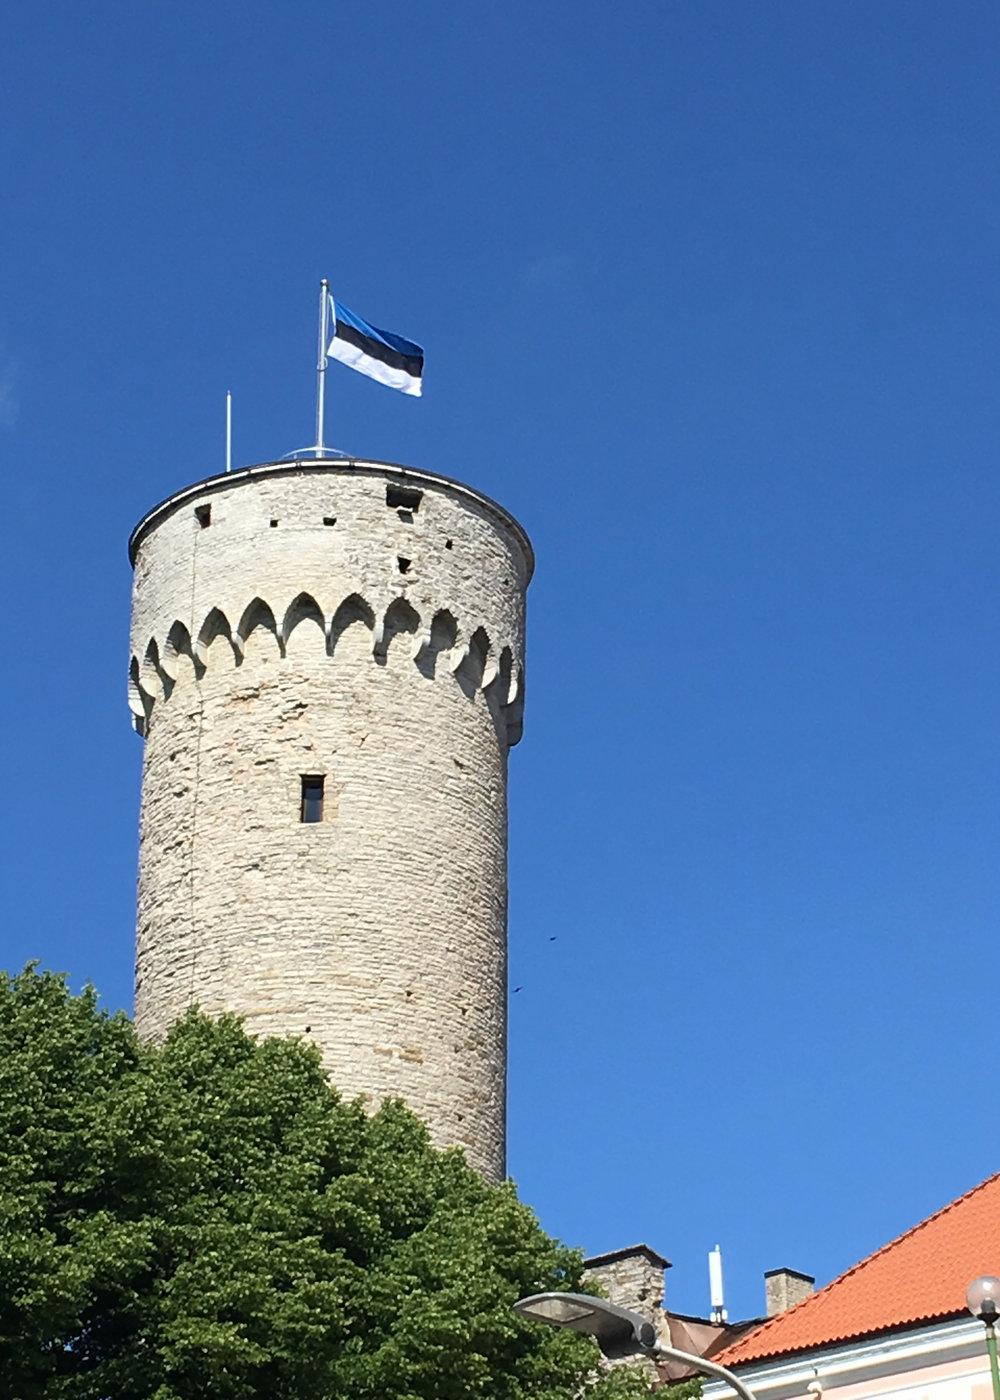 ESTONIA - Old town 1.jpg